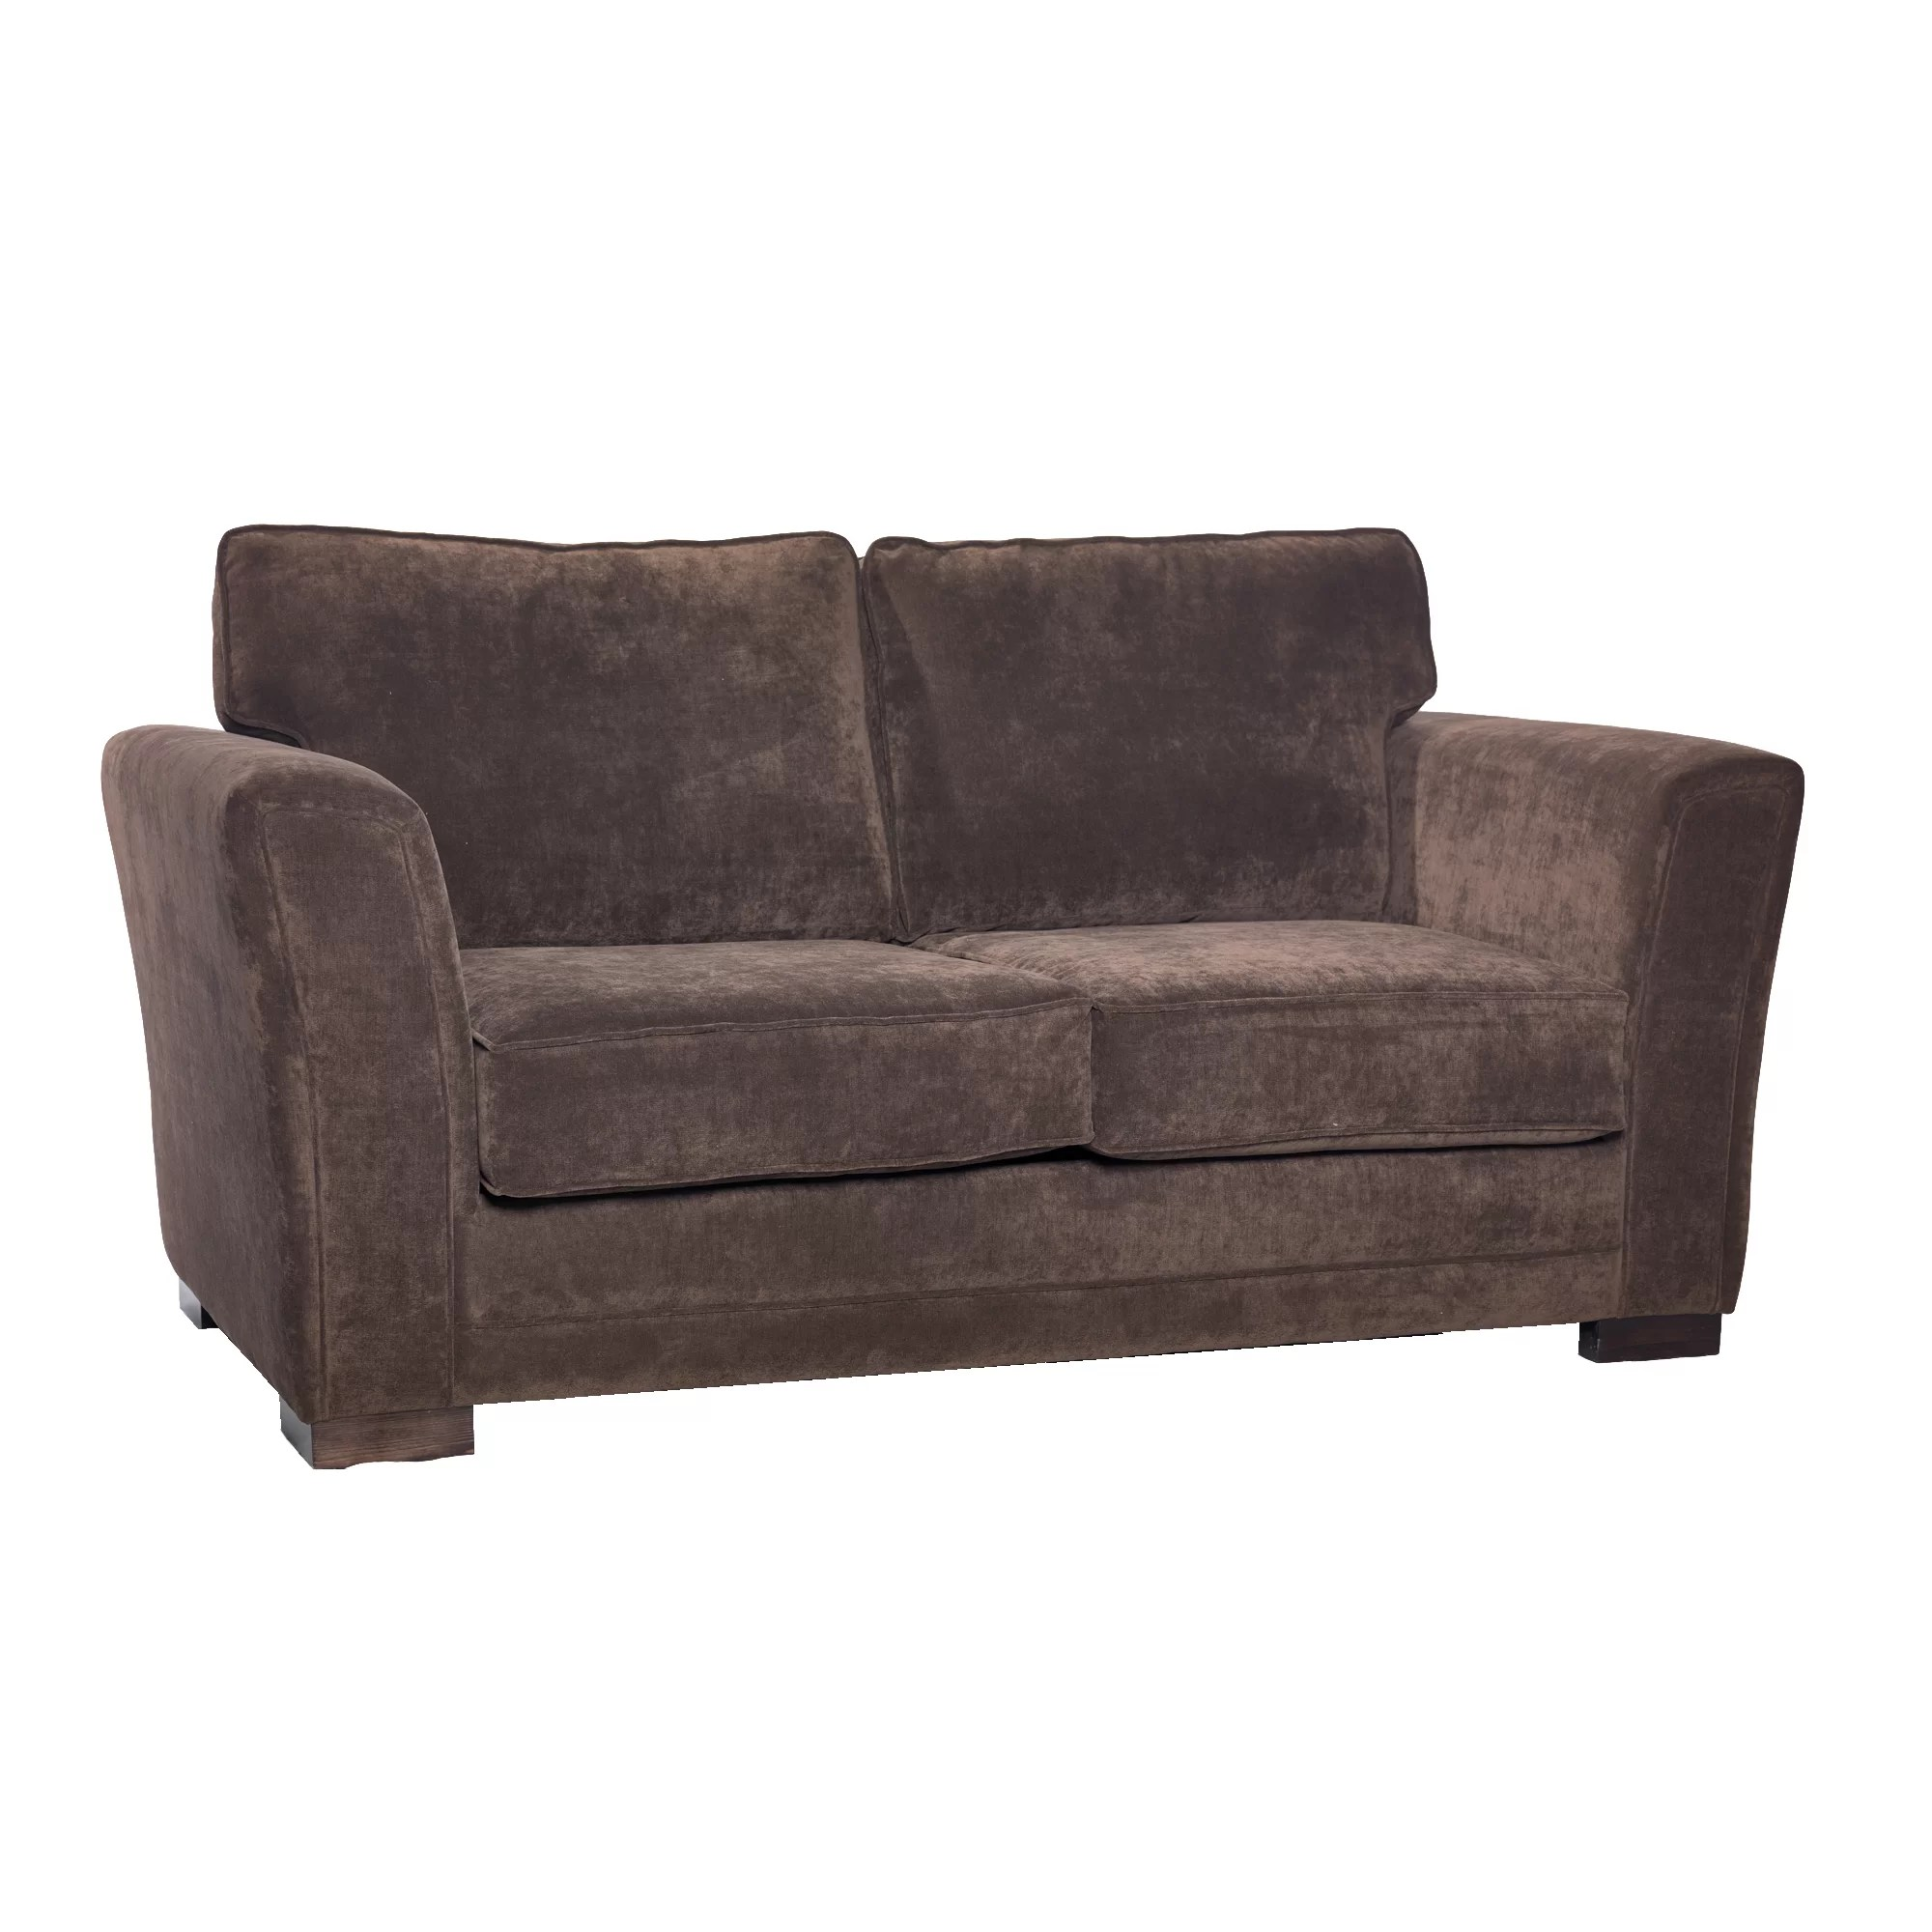 3 seater sofa throws uk craigslist montreal sectional icon design venice wayfair